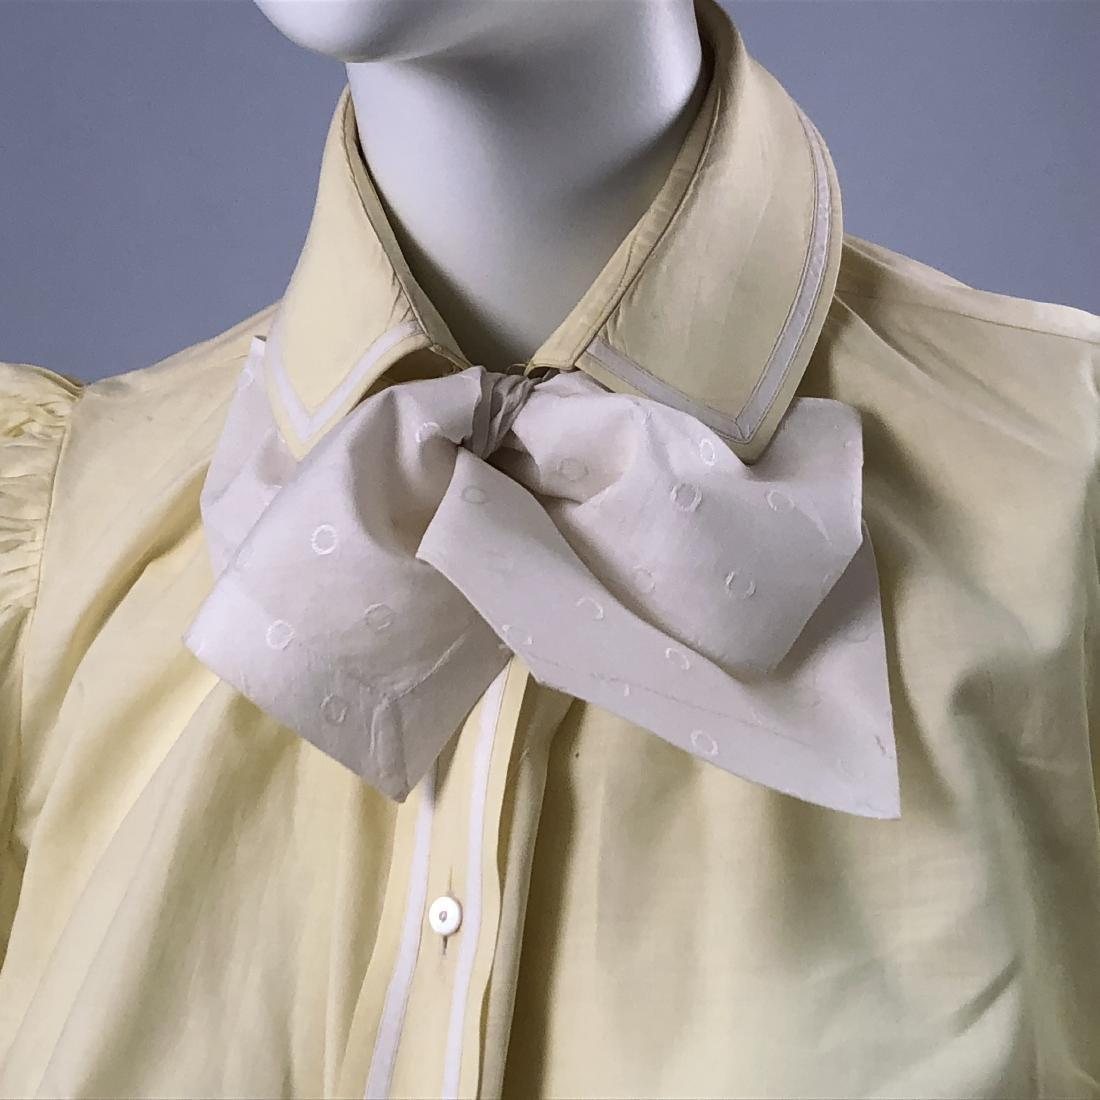 COTTON BLOUSE, 1895 - 1897, worn by KATHERINE HEPBURN - 2